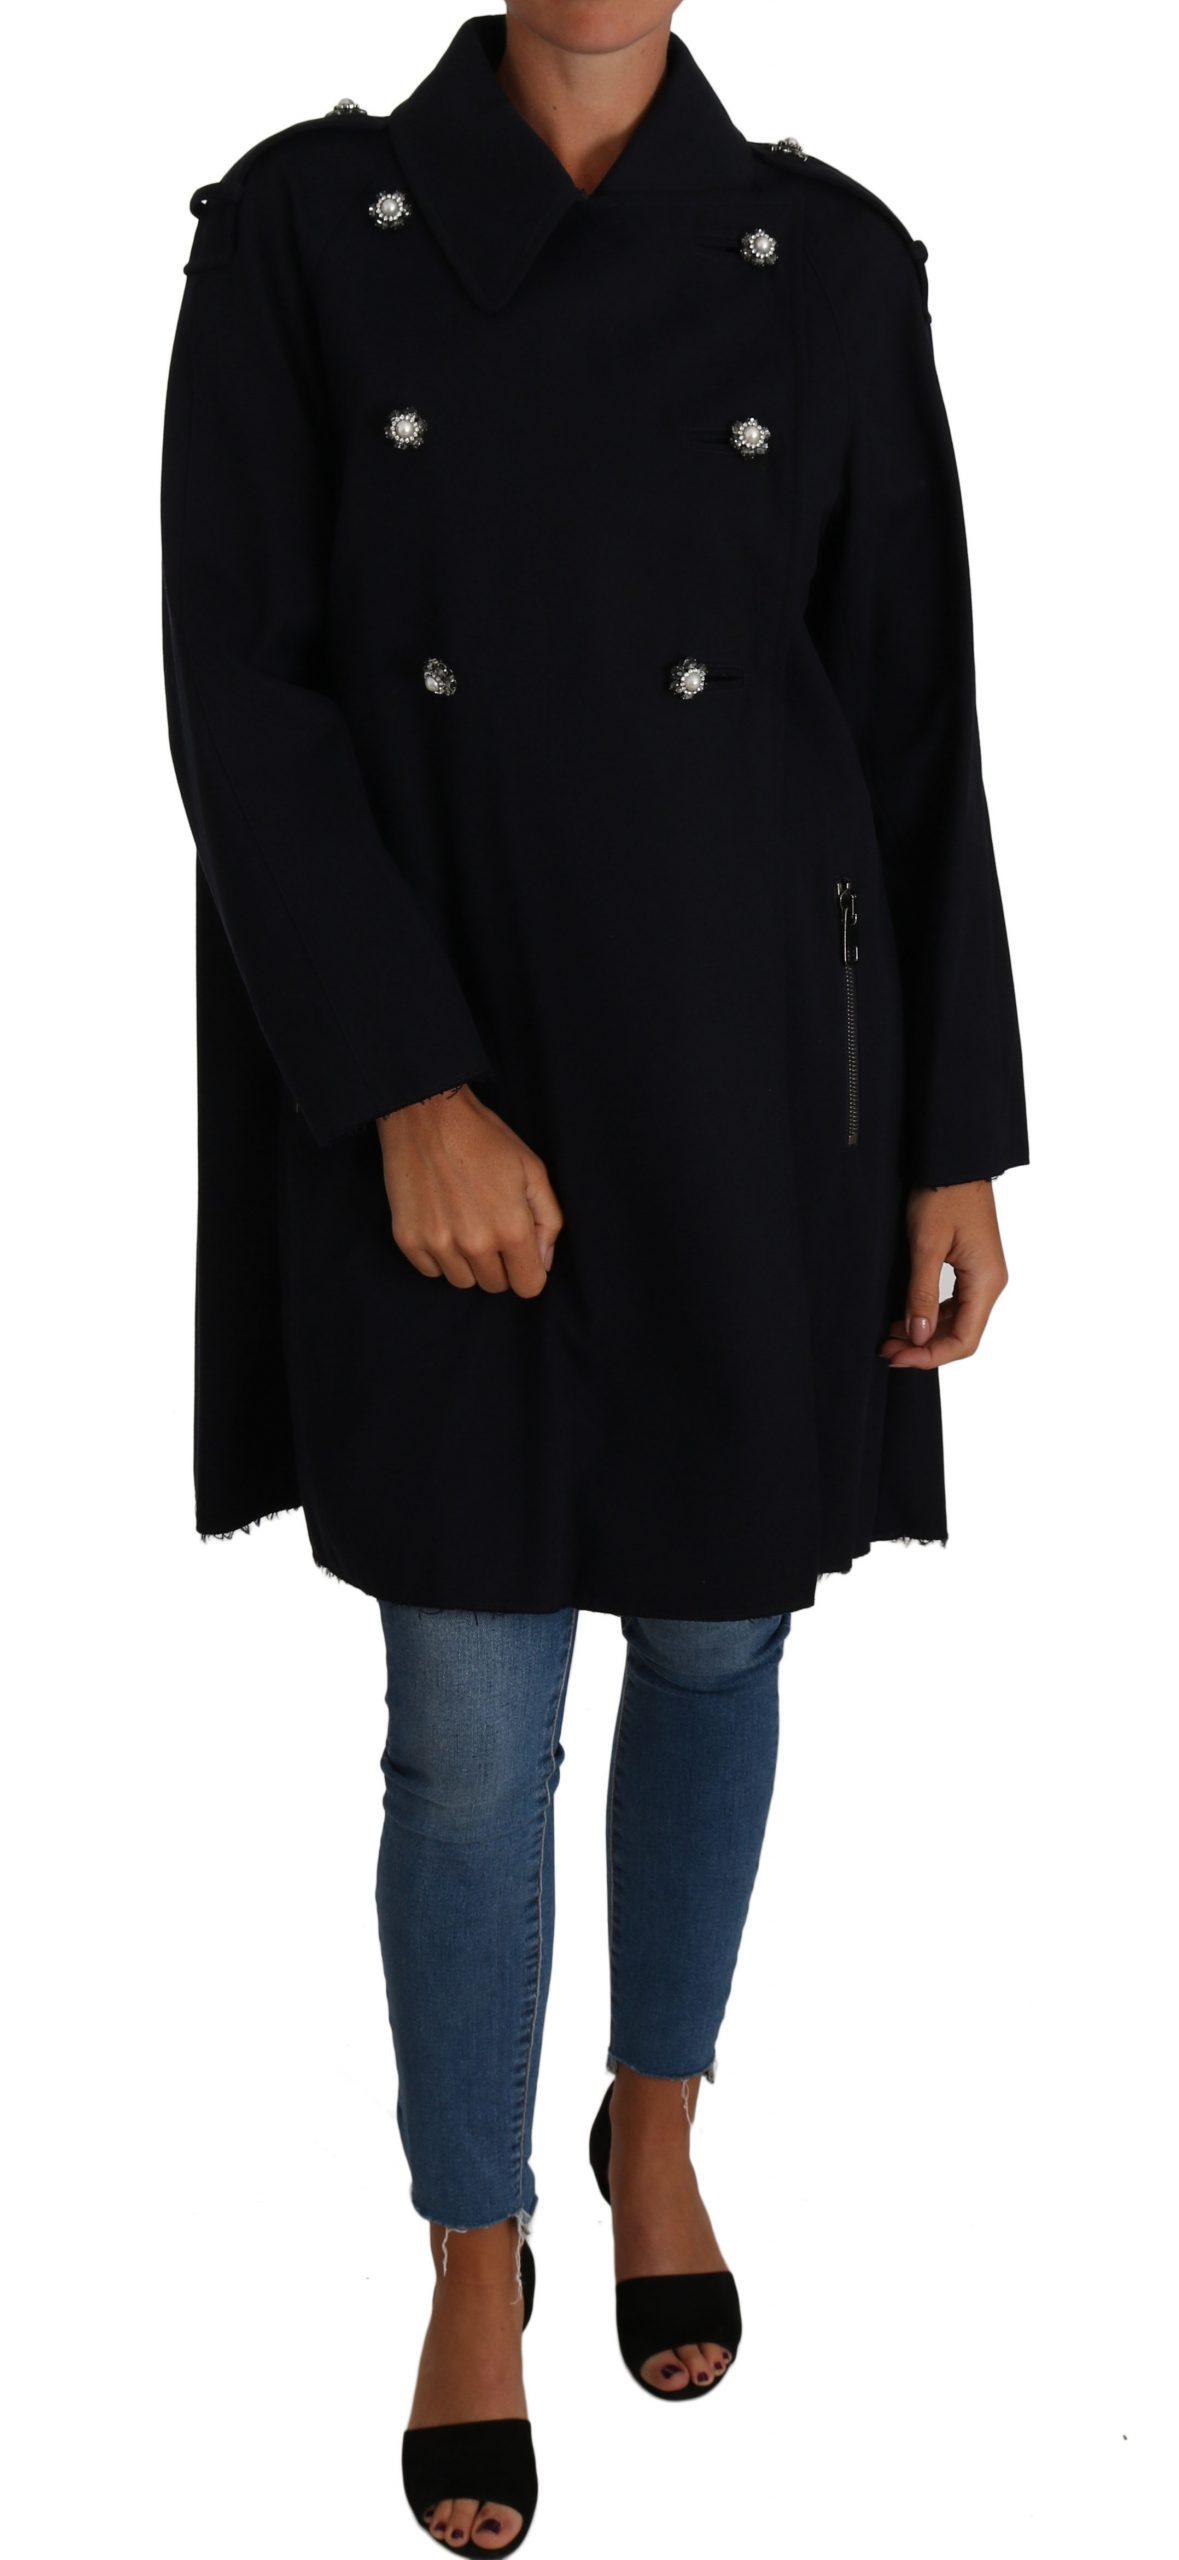 Dolce & Gabbana Women's Crystal Buttons Trench A-Line Coat Blue JKT2226 - IT42|M